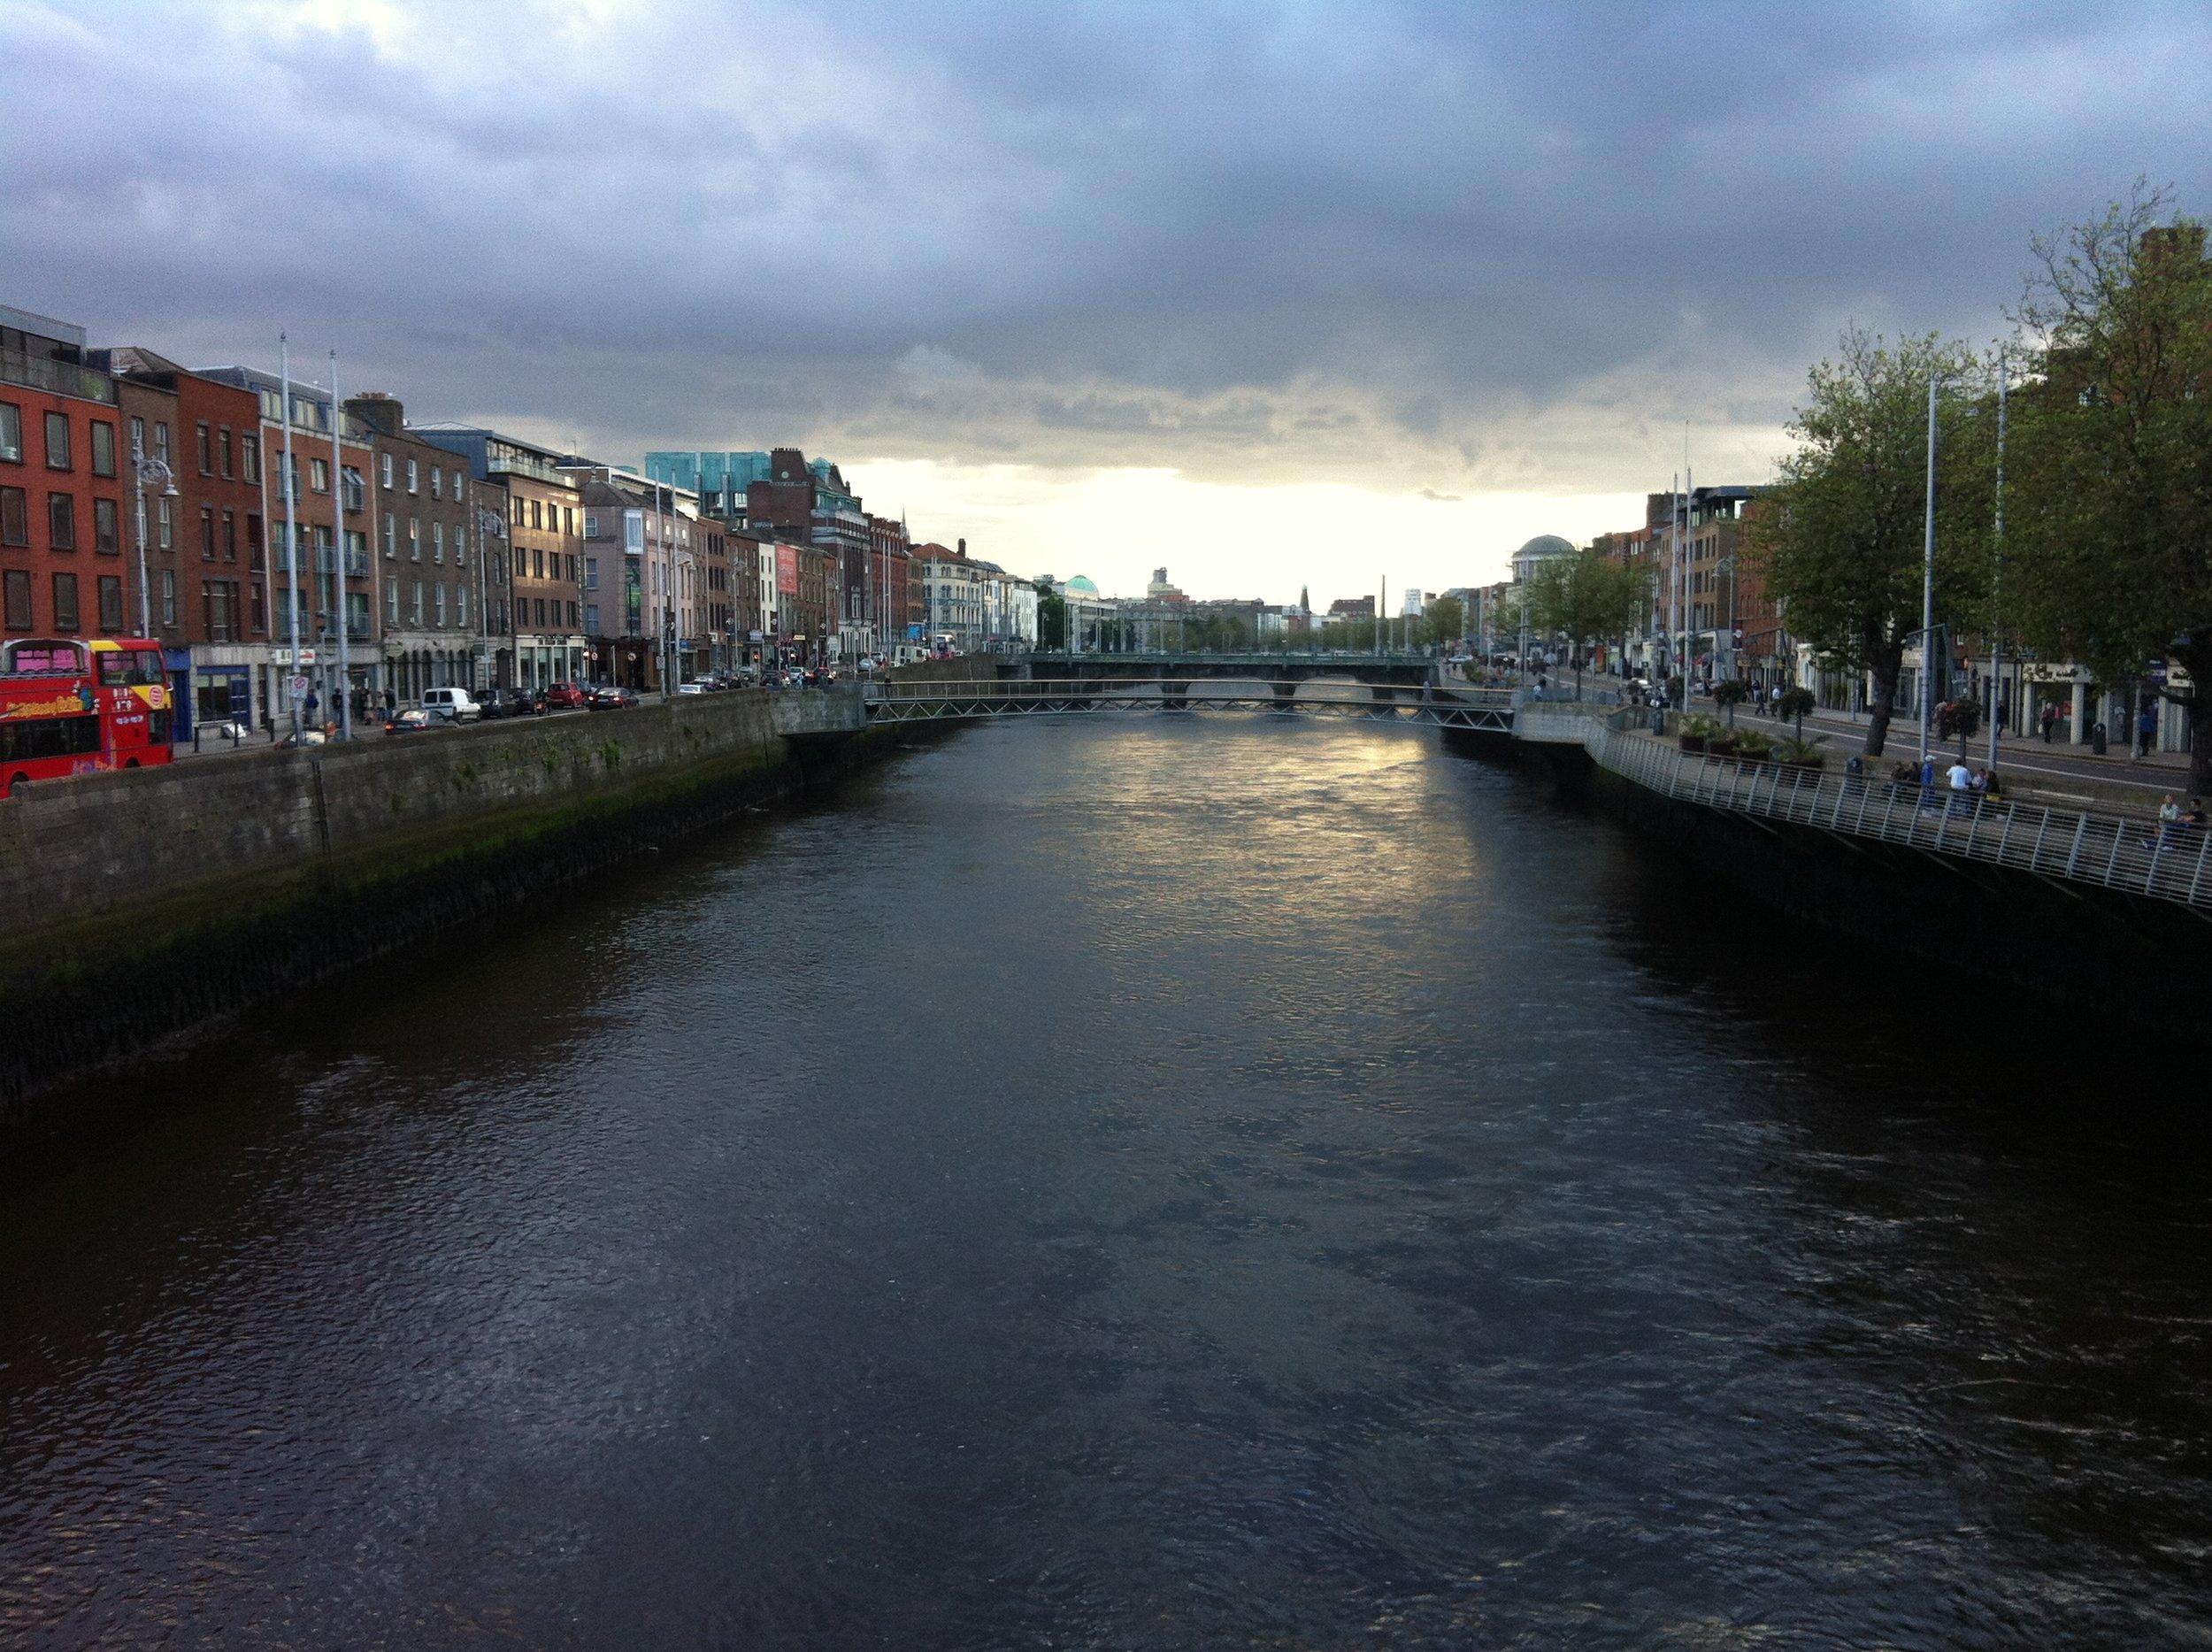 River Liffey - Dublin, Ireland